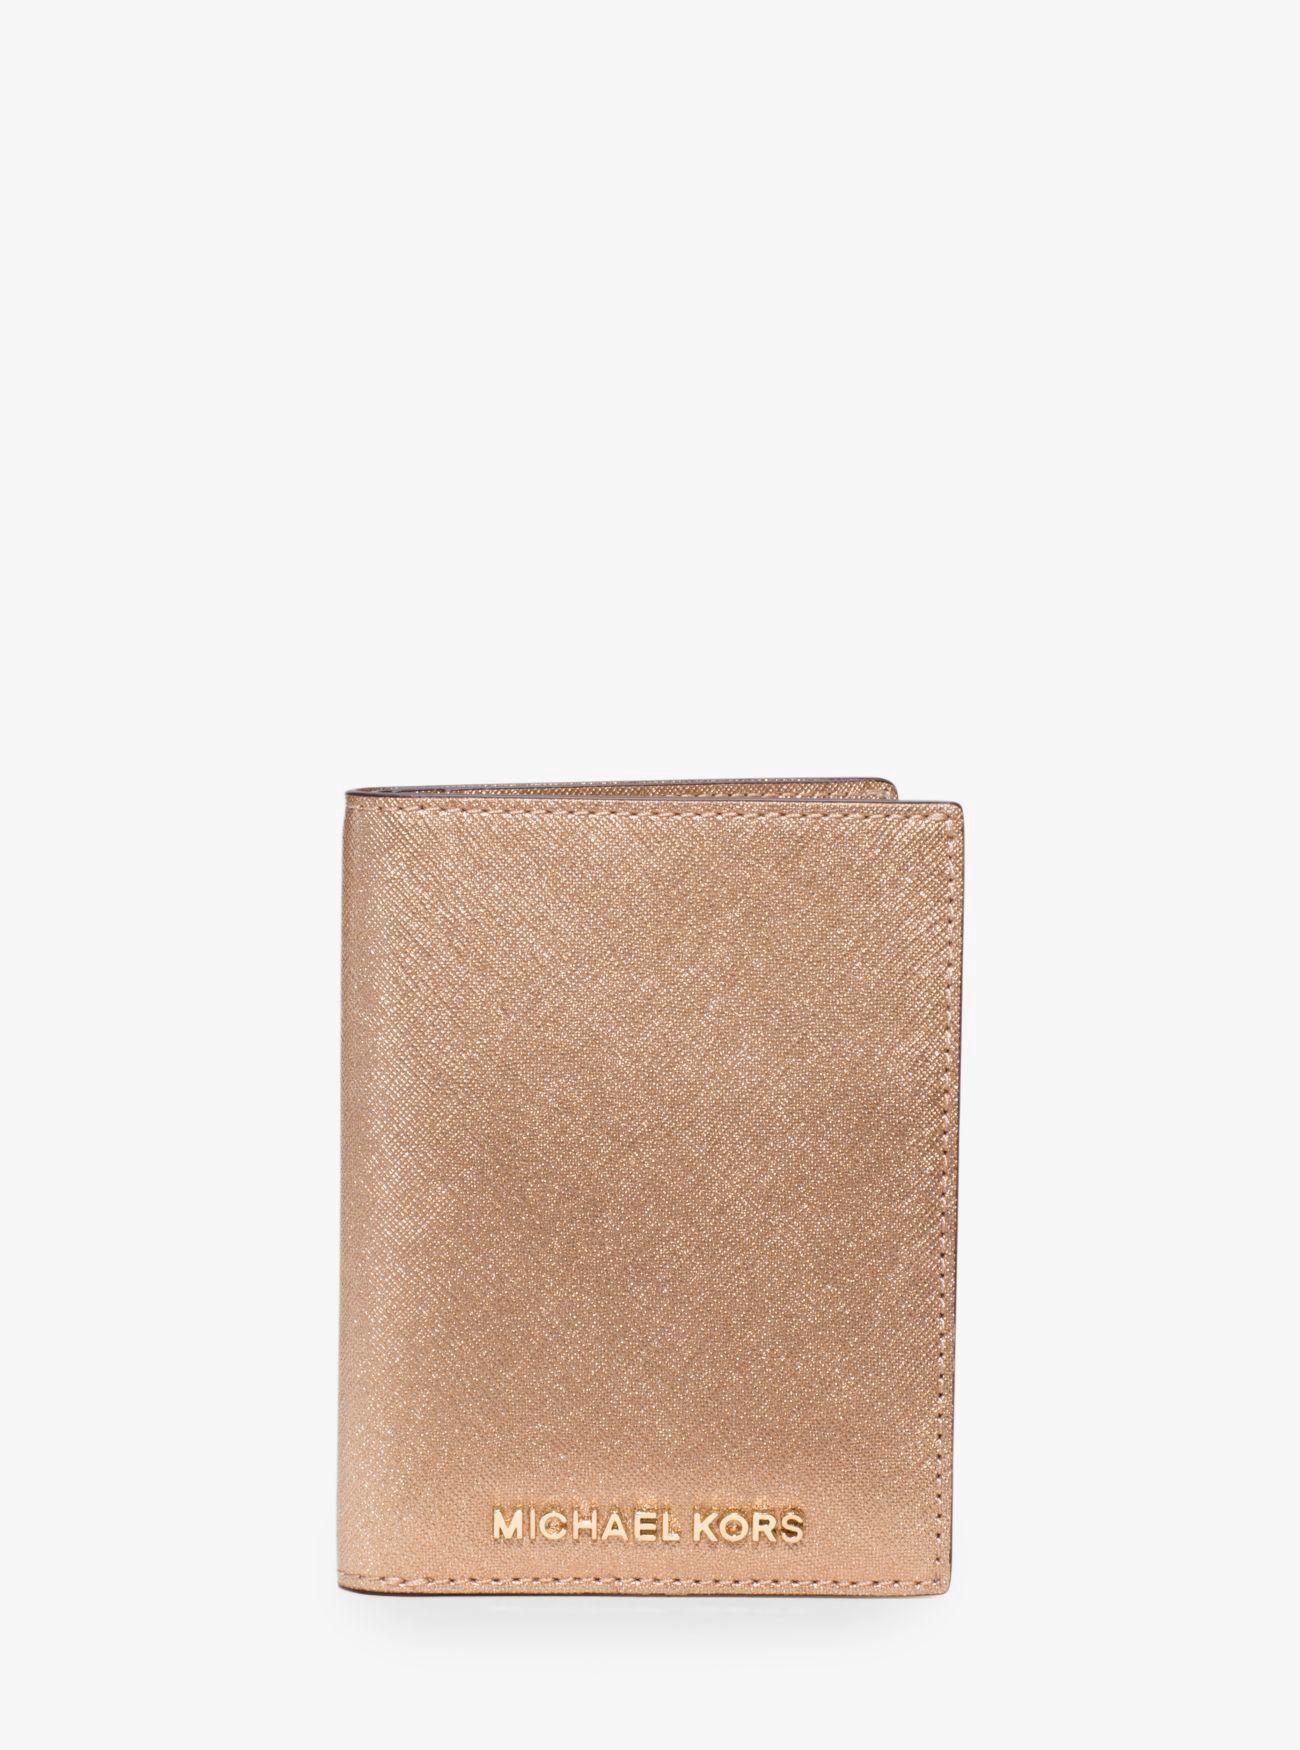 e8a7b5372684 MICHAEL KORS Jet Set Travel Metallic Saffiano Leather Card Holder. # michaelkors #all